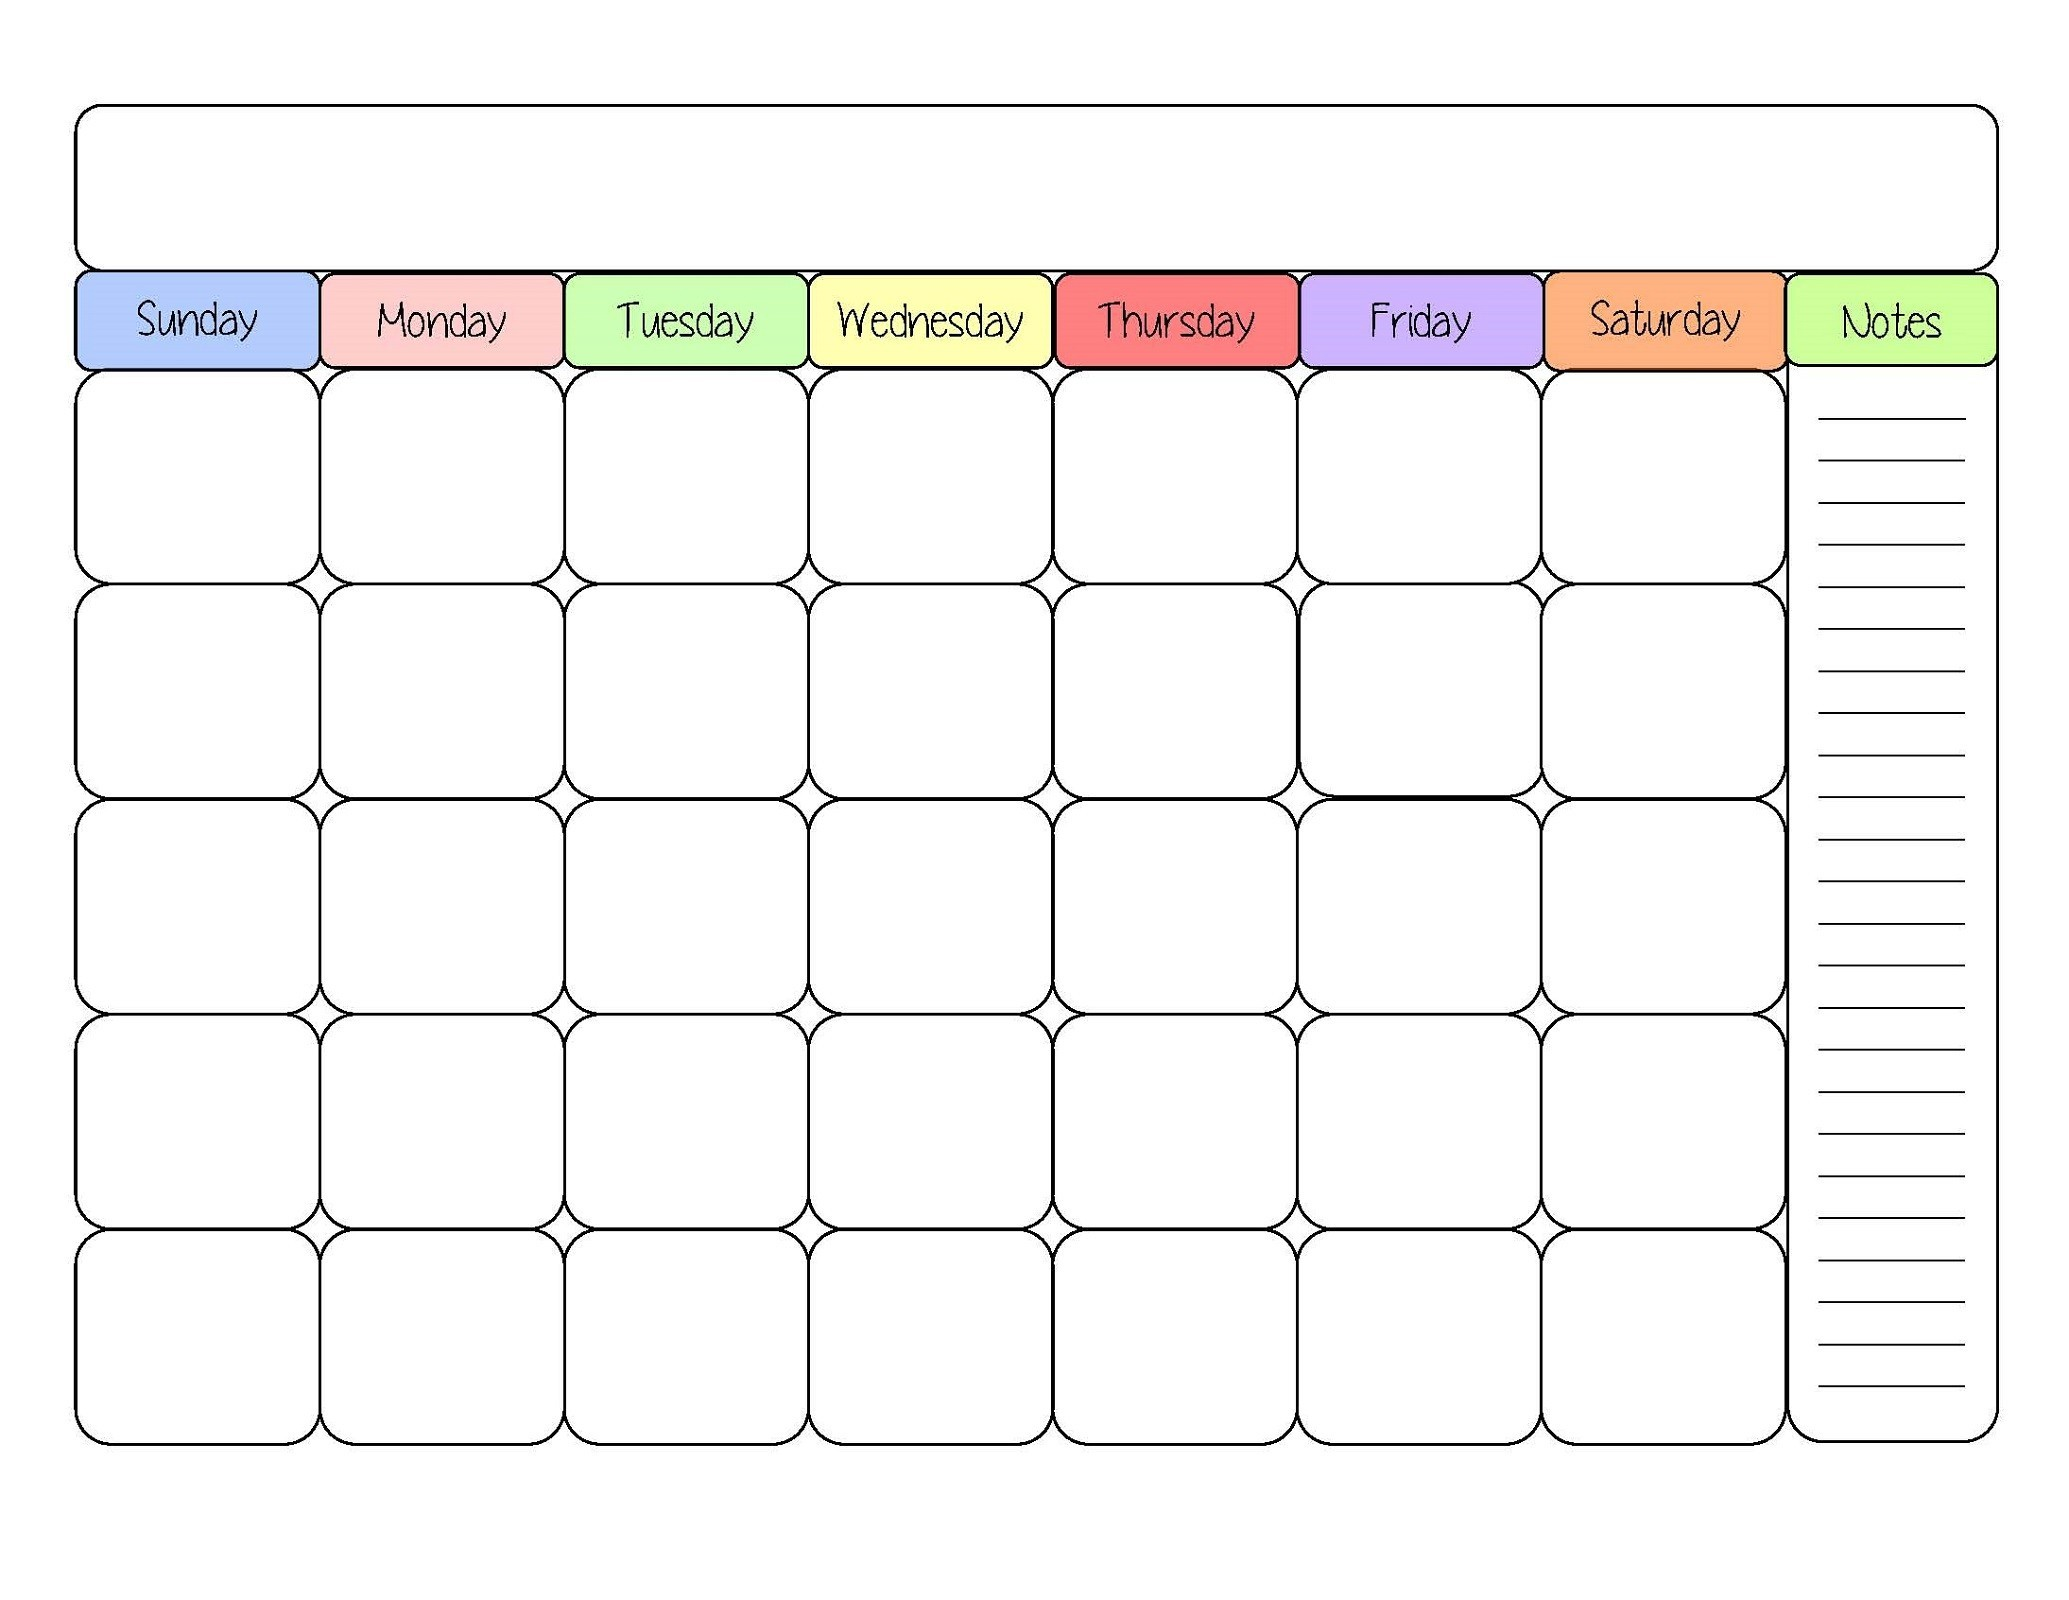 Calendario Imprimir Vertex Más Reciente Best Printable Calendar Templates Of Calendario Imprimir Vertex Más Recientes Printable Blank Run Charts Architecture Modern Idea •